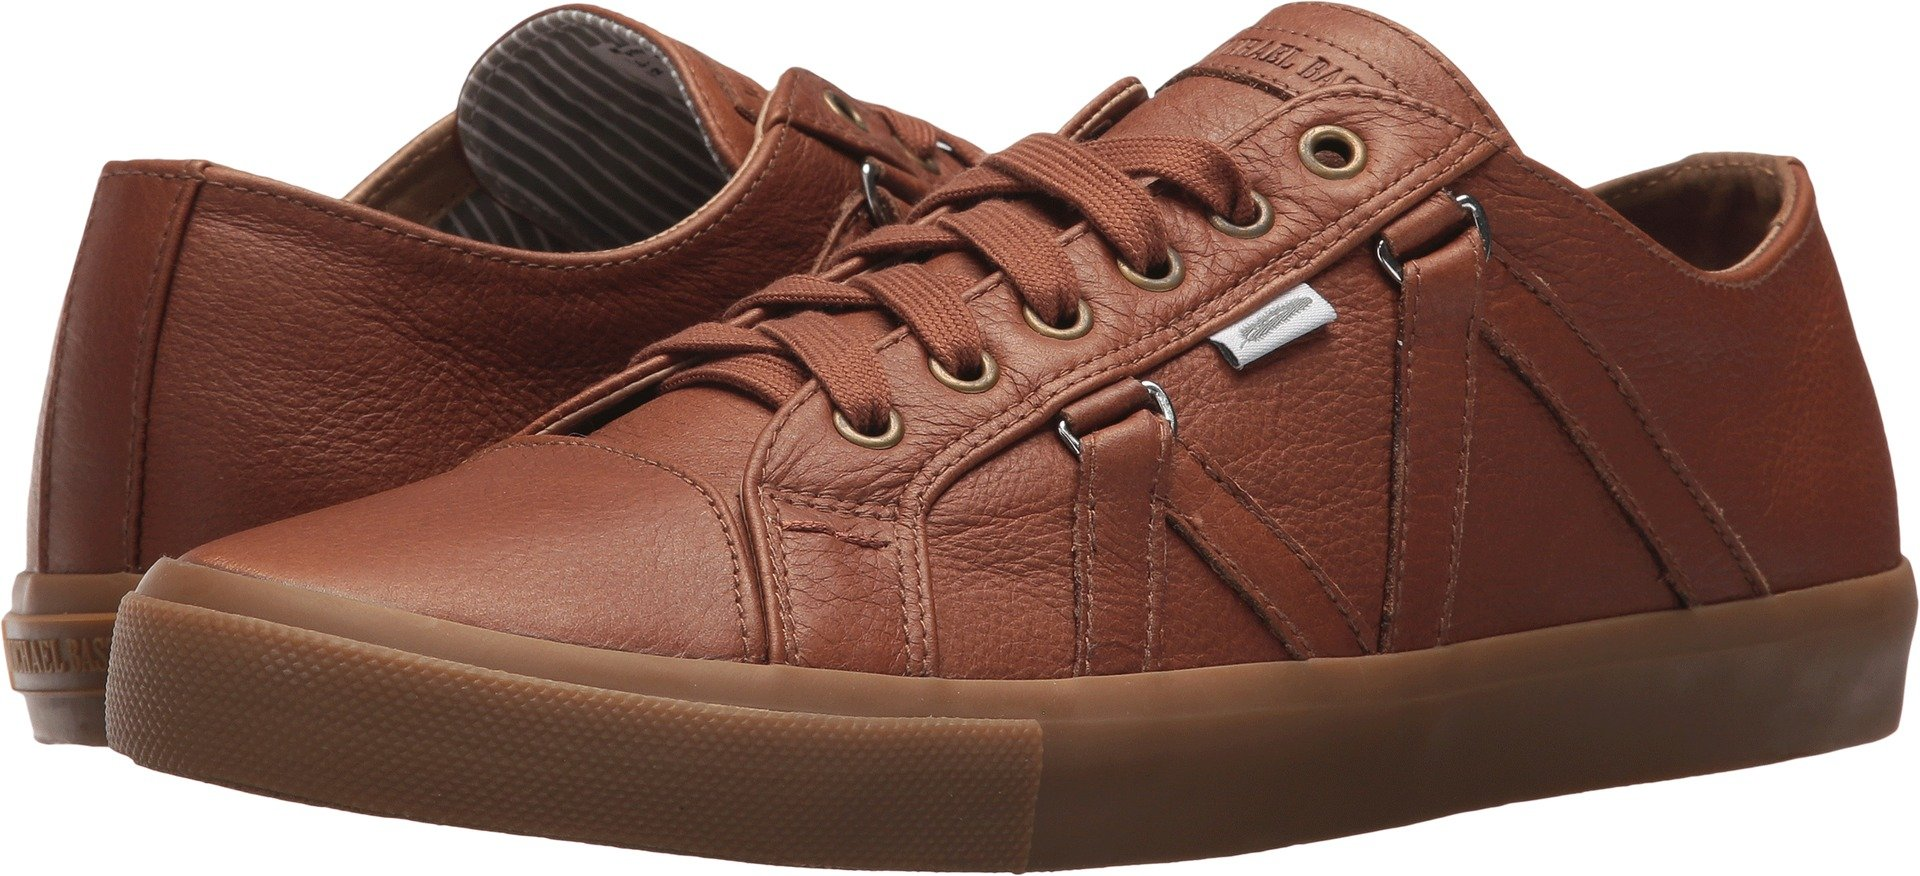 Michael Bastian Men's Signature Sneaker, Cotton, 11 M US